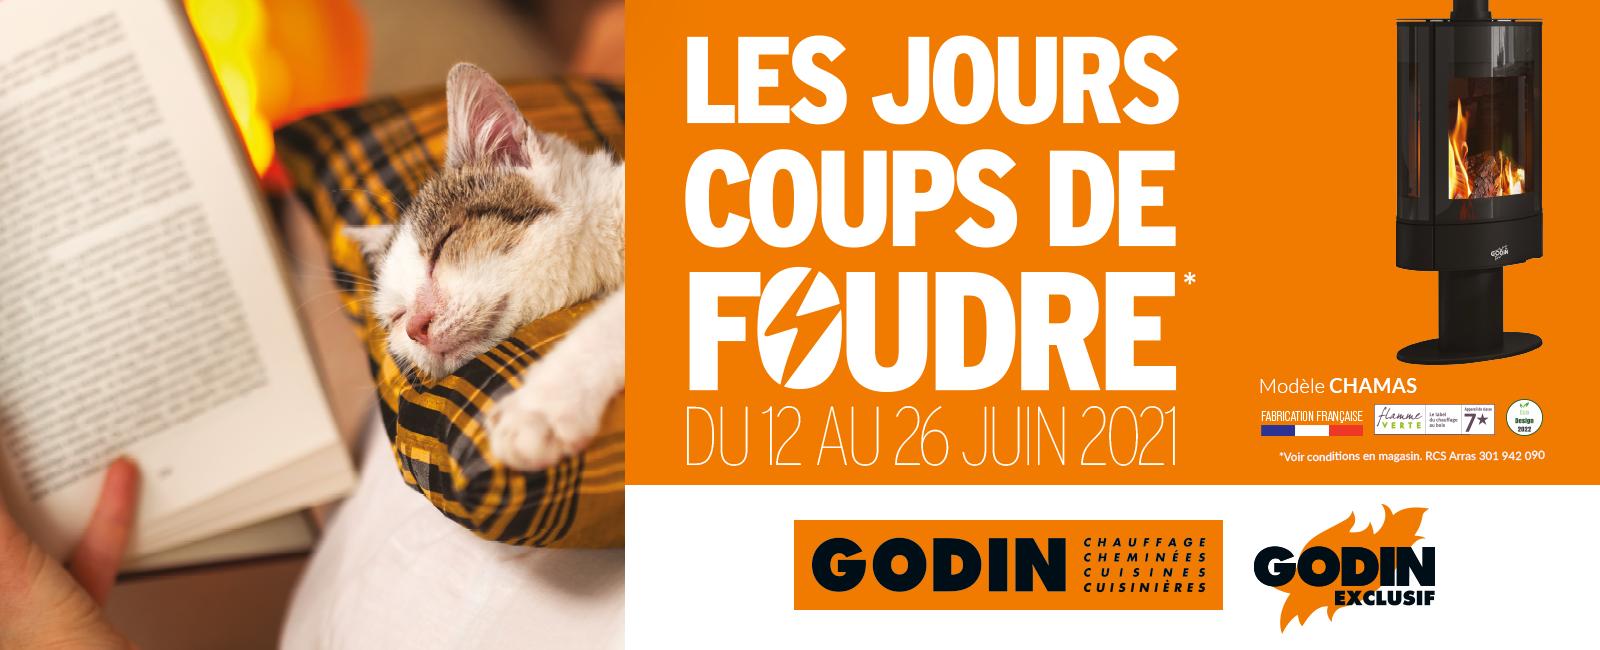 godin_opjuin_notoriété_fbk_1600x650